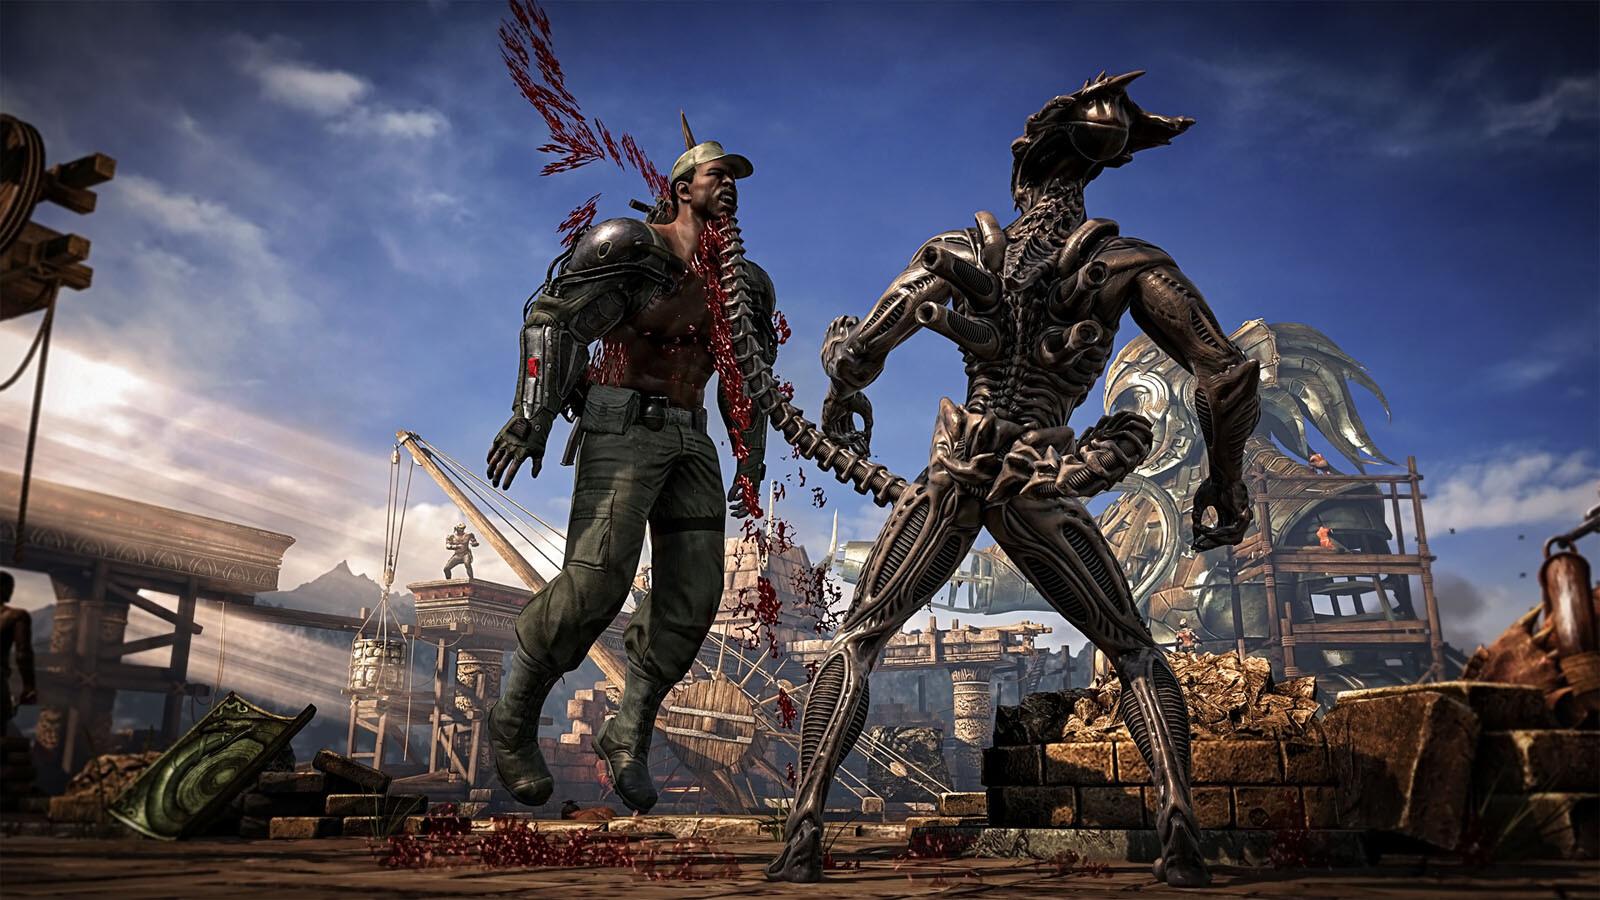 Scorpion Mortal Kombat Hd Wallpaper Mortal Kombat Xl Steam Cd Key For Pc Buy Now